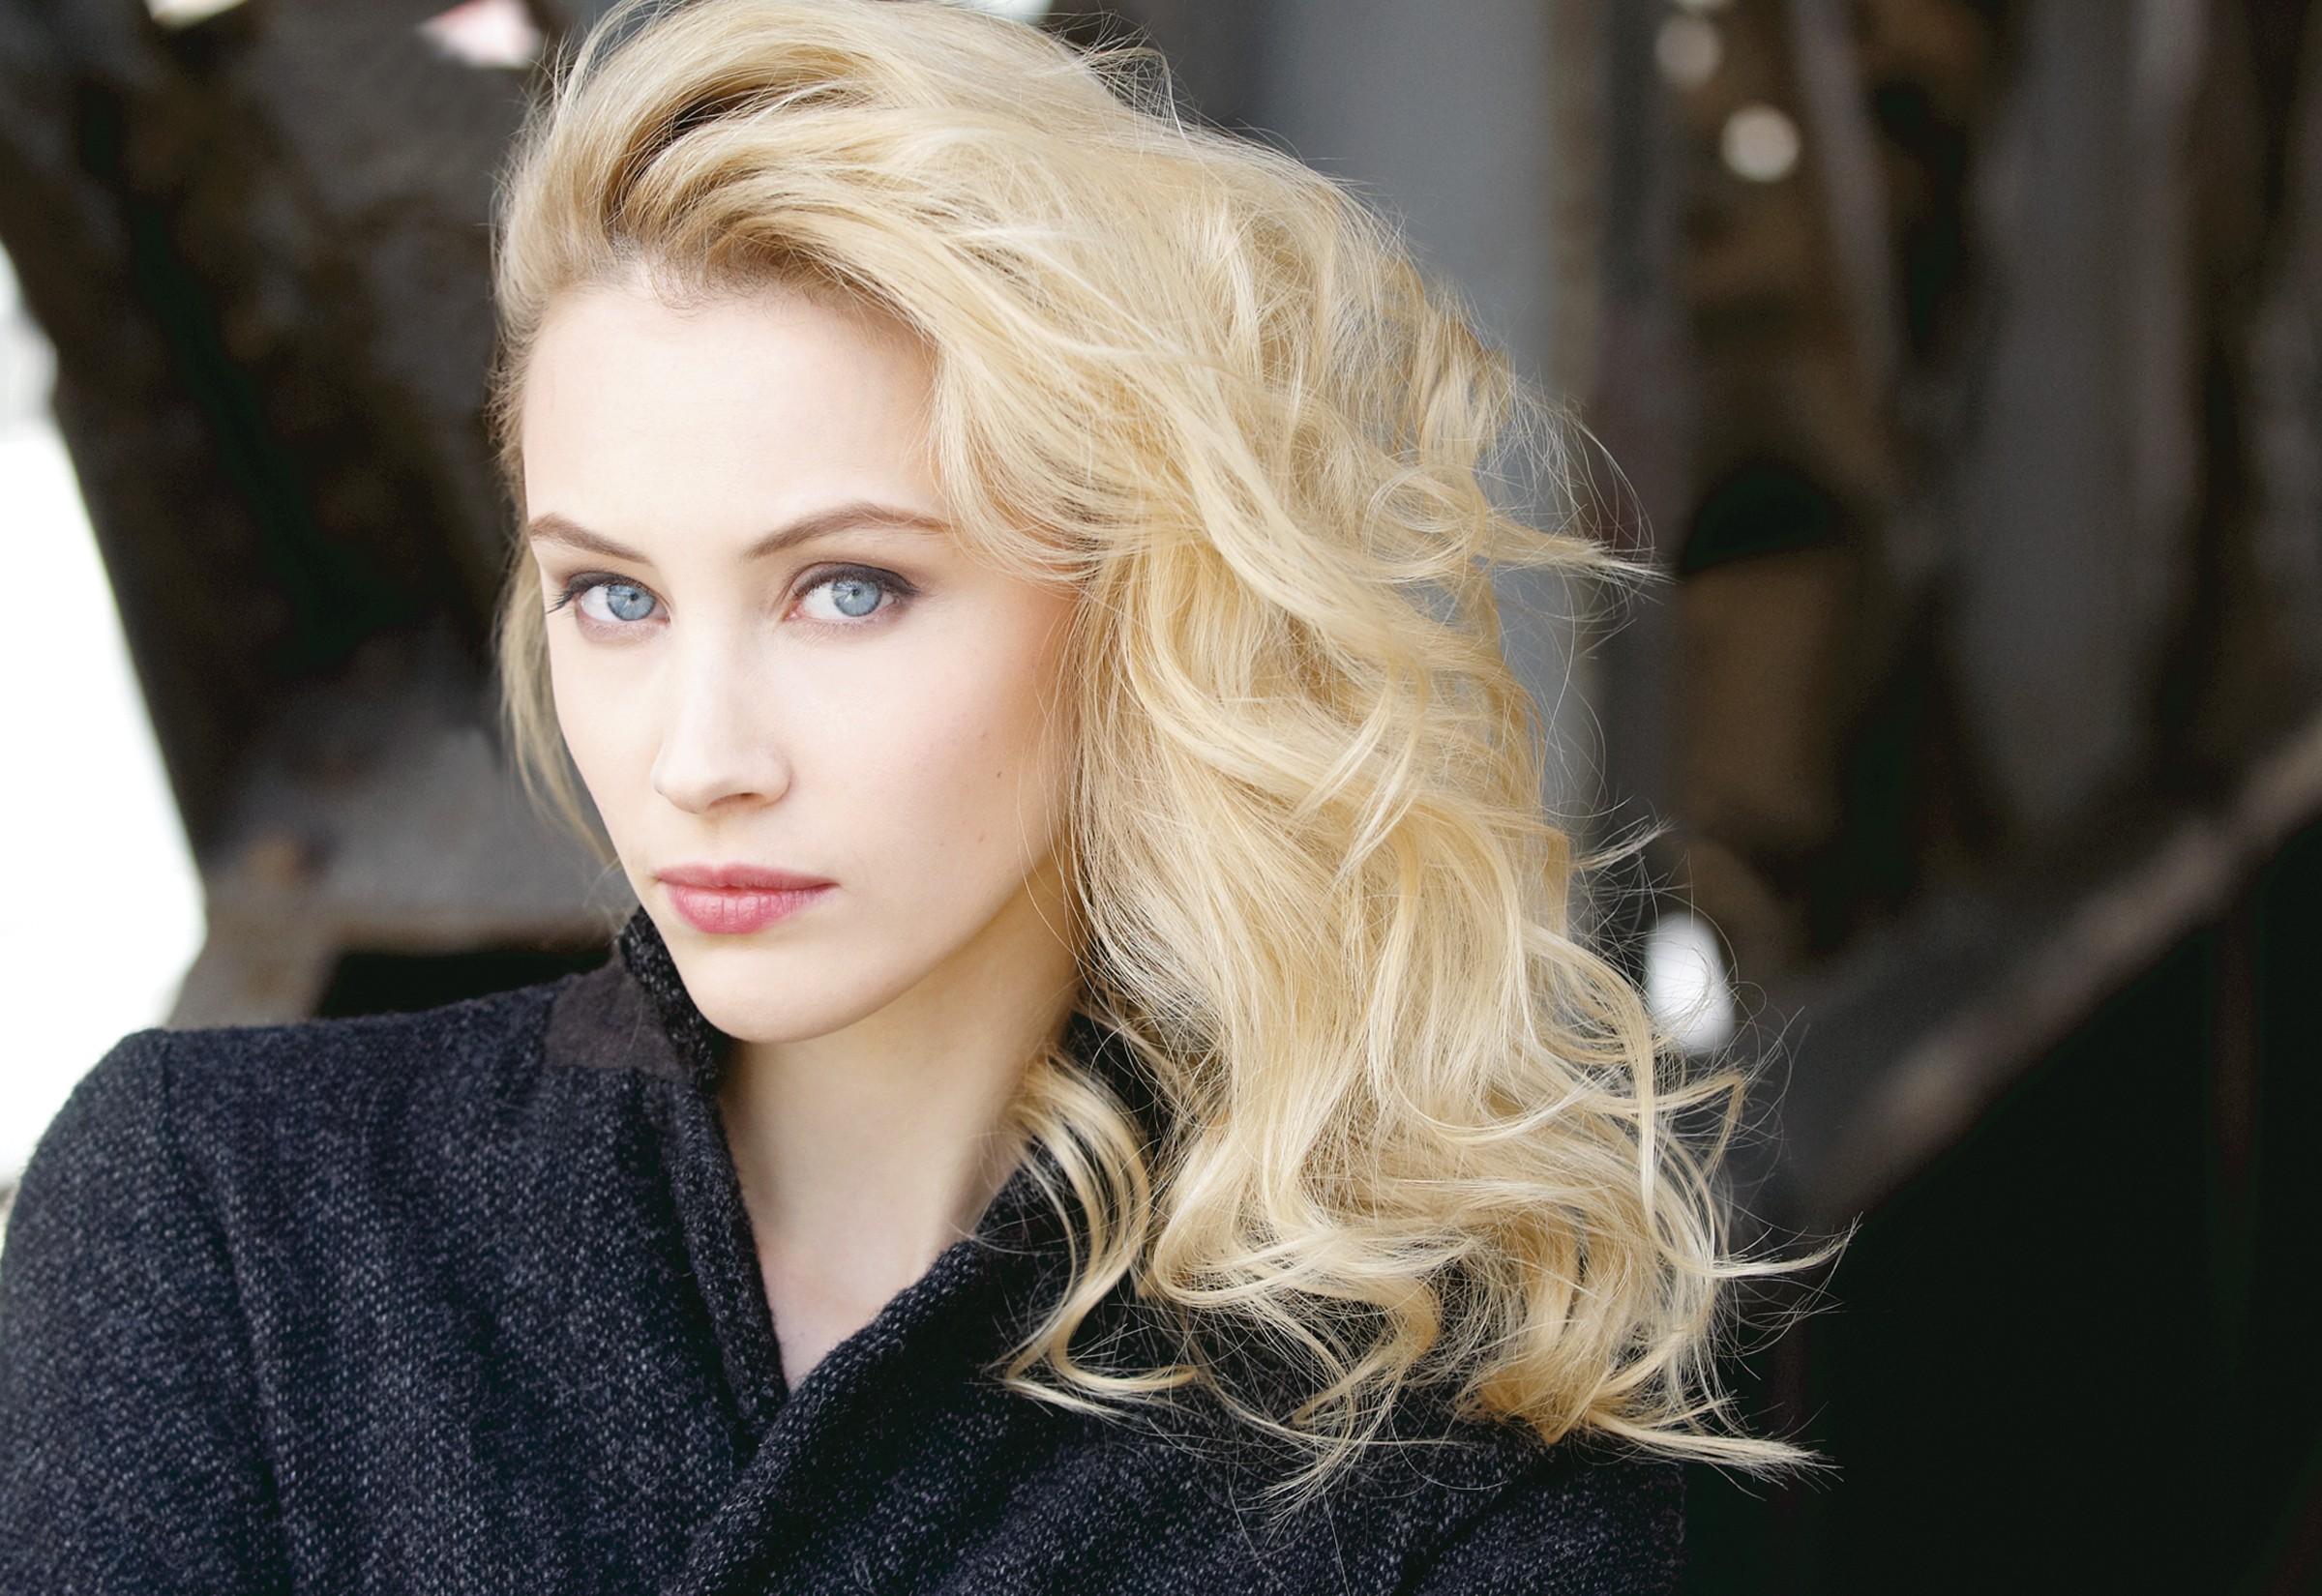 Wallpaper Face Women Model Blonde Long Hair Blue Eyes